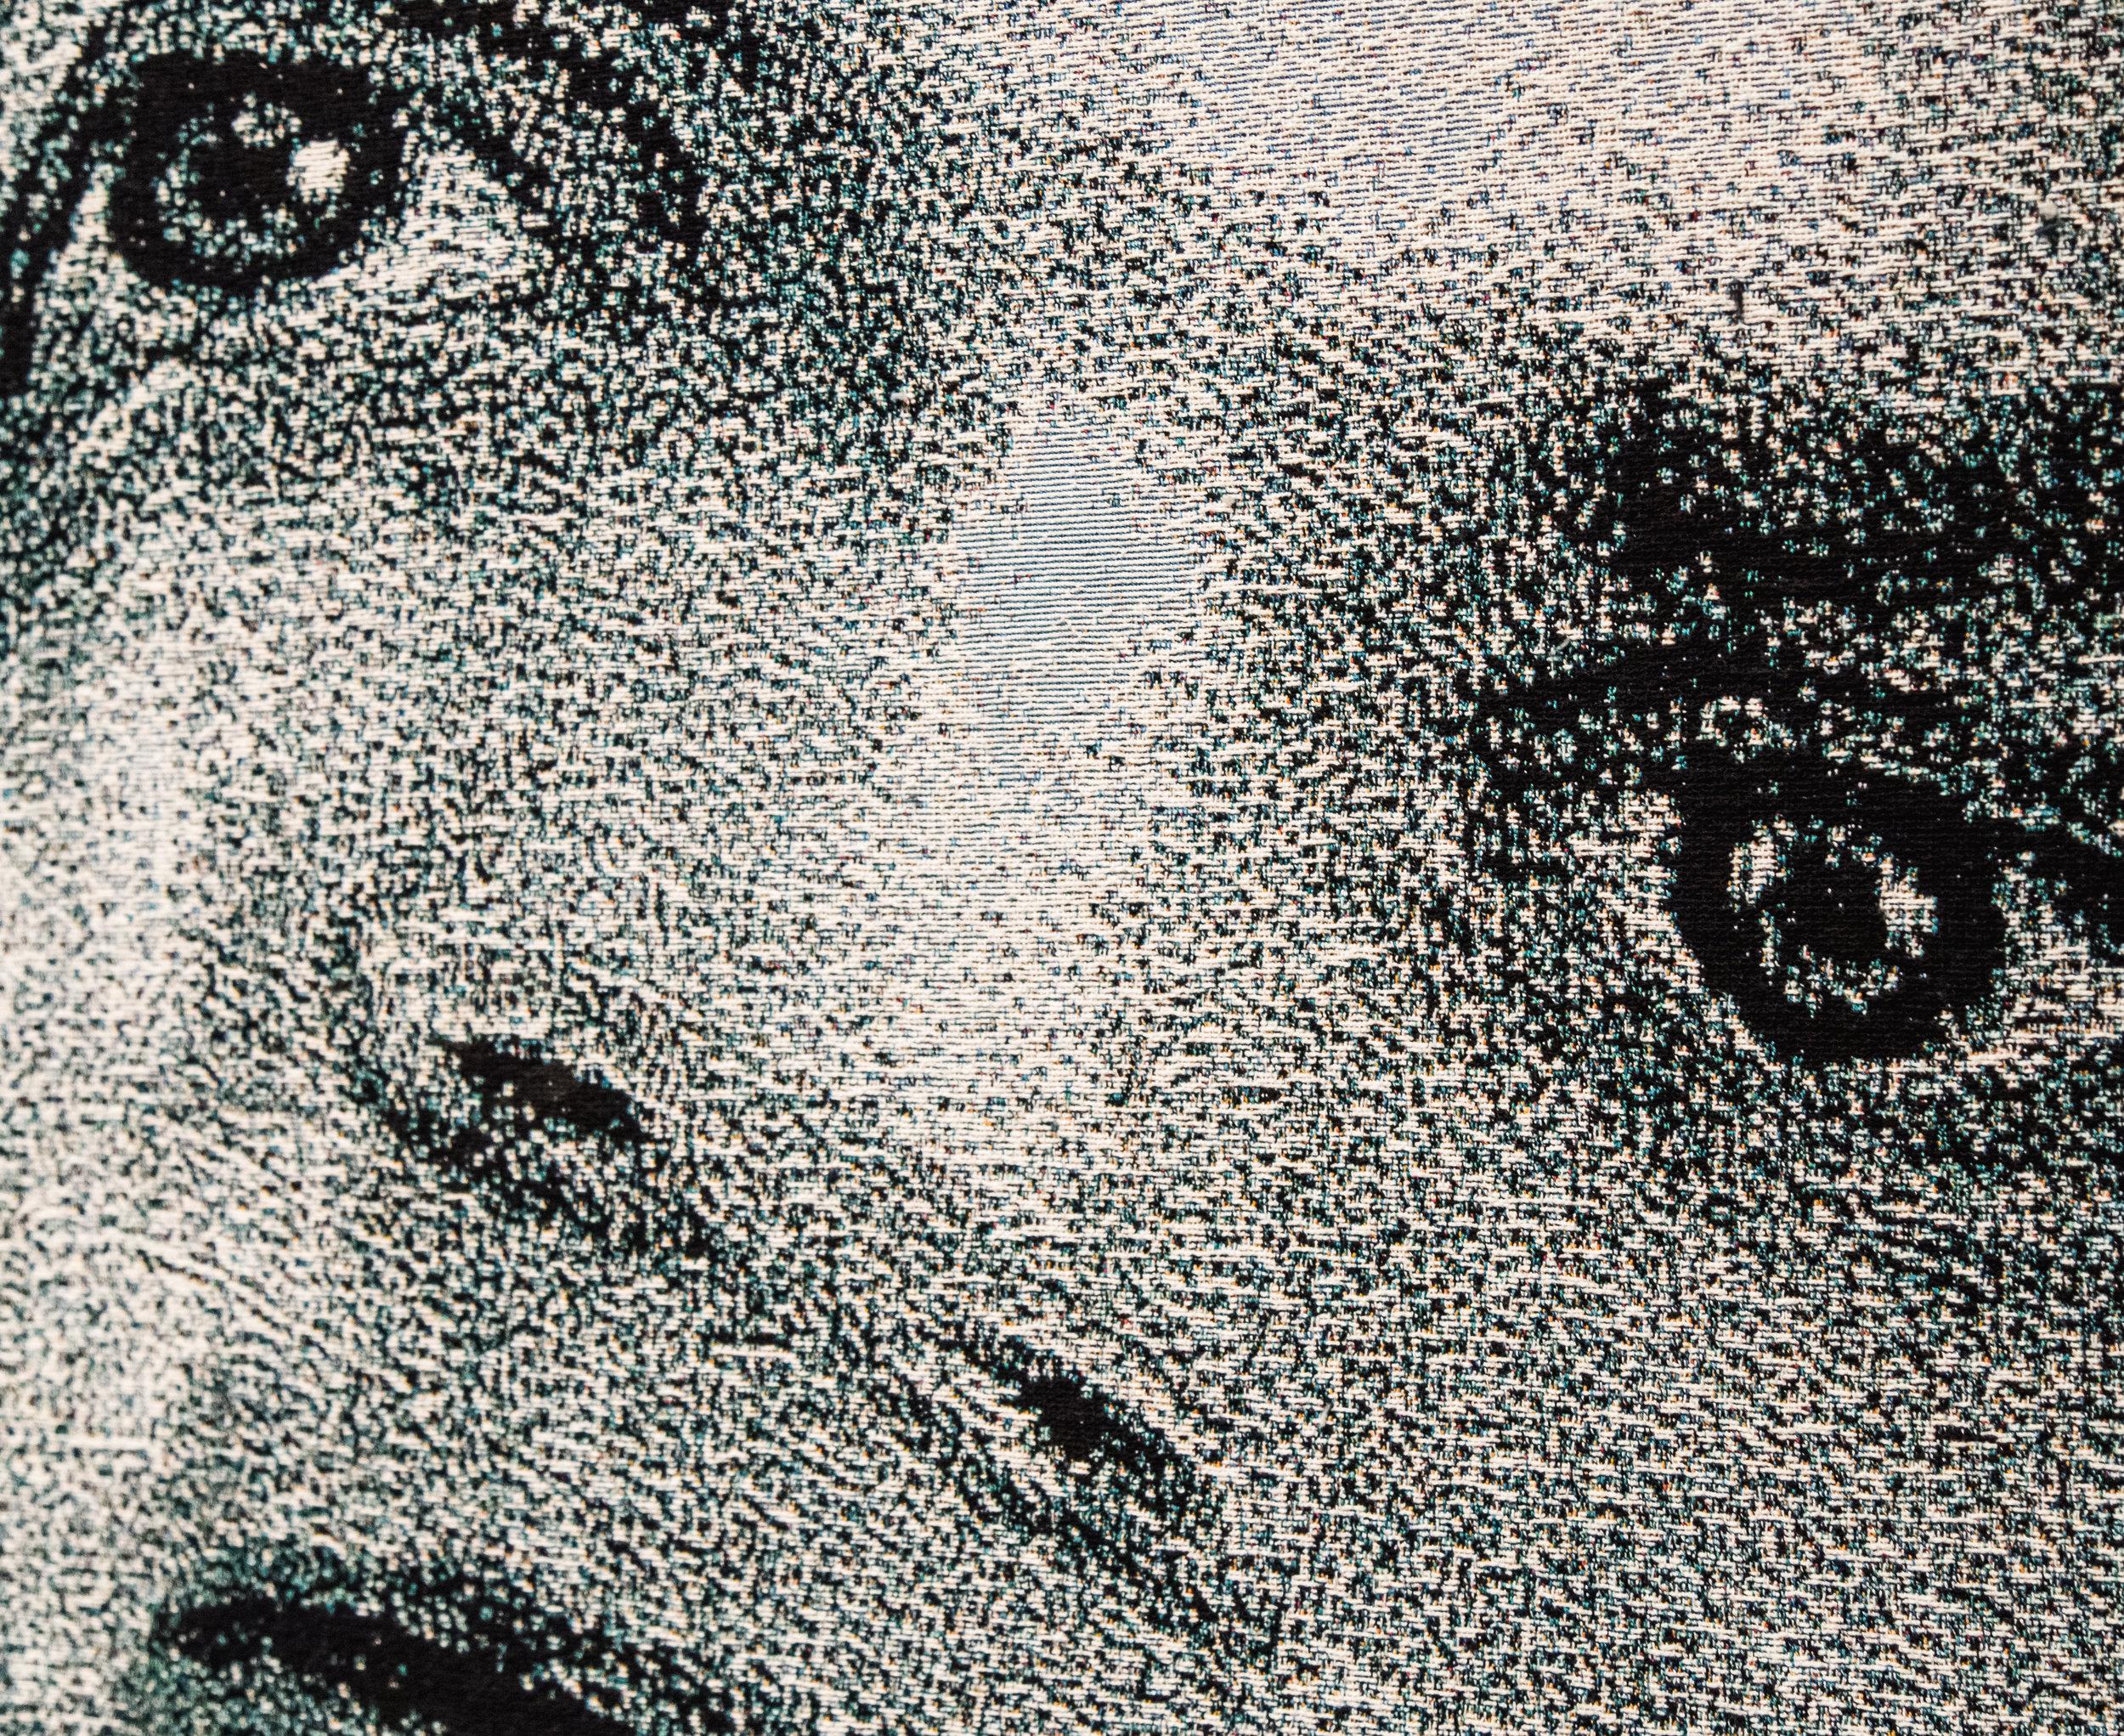 "Der Raub/Stanford Rapist  (close-up), 2016-2017, Jacquard tapestries, (2 panels), 104"" x 74"""